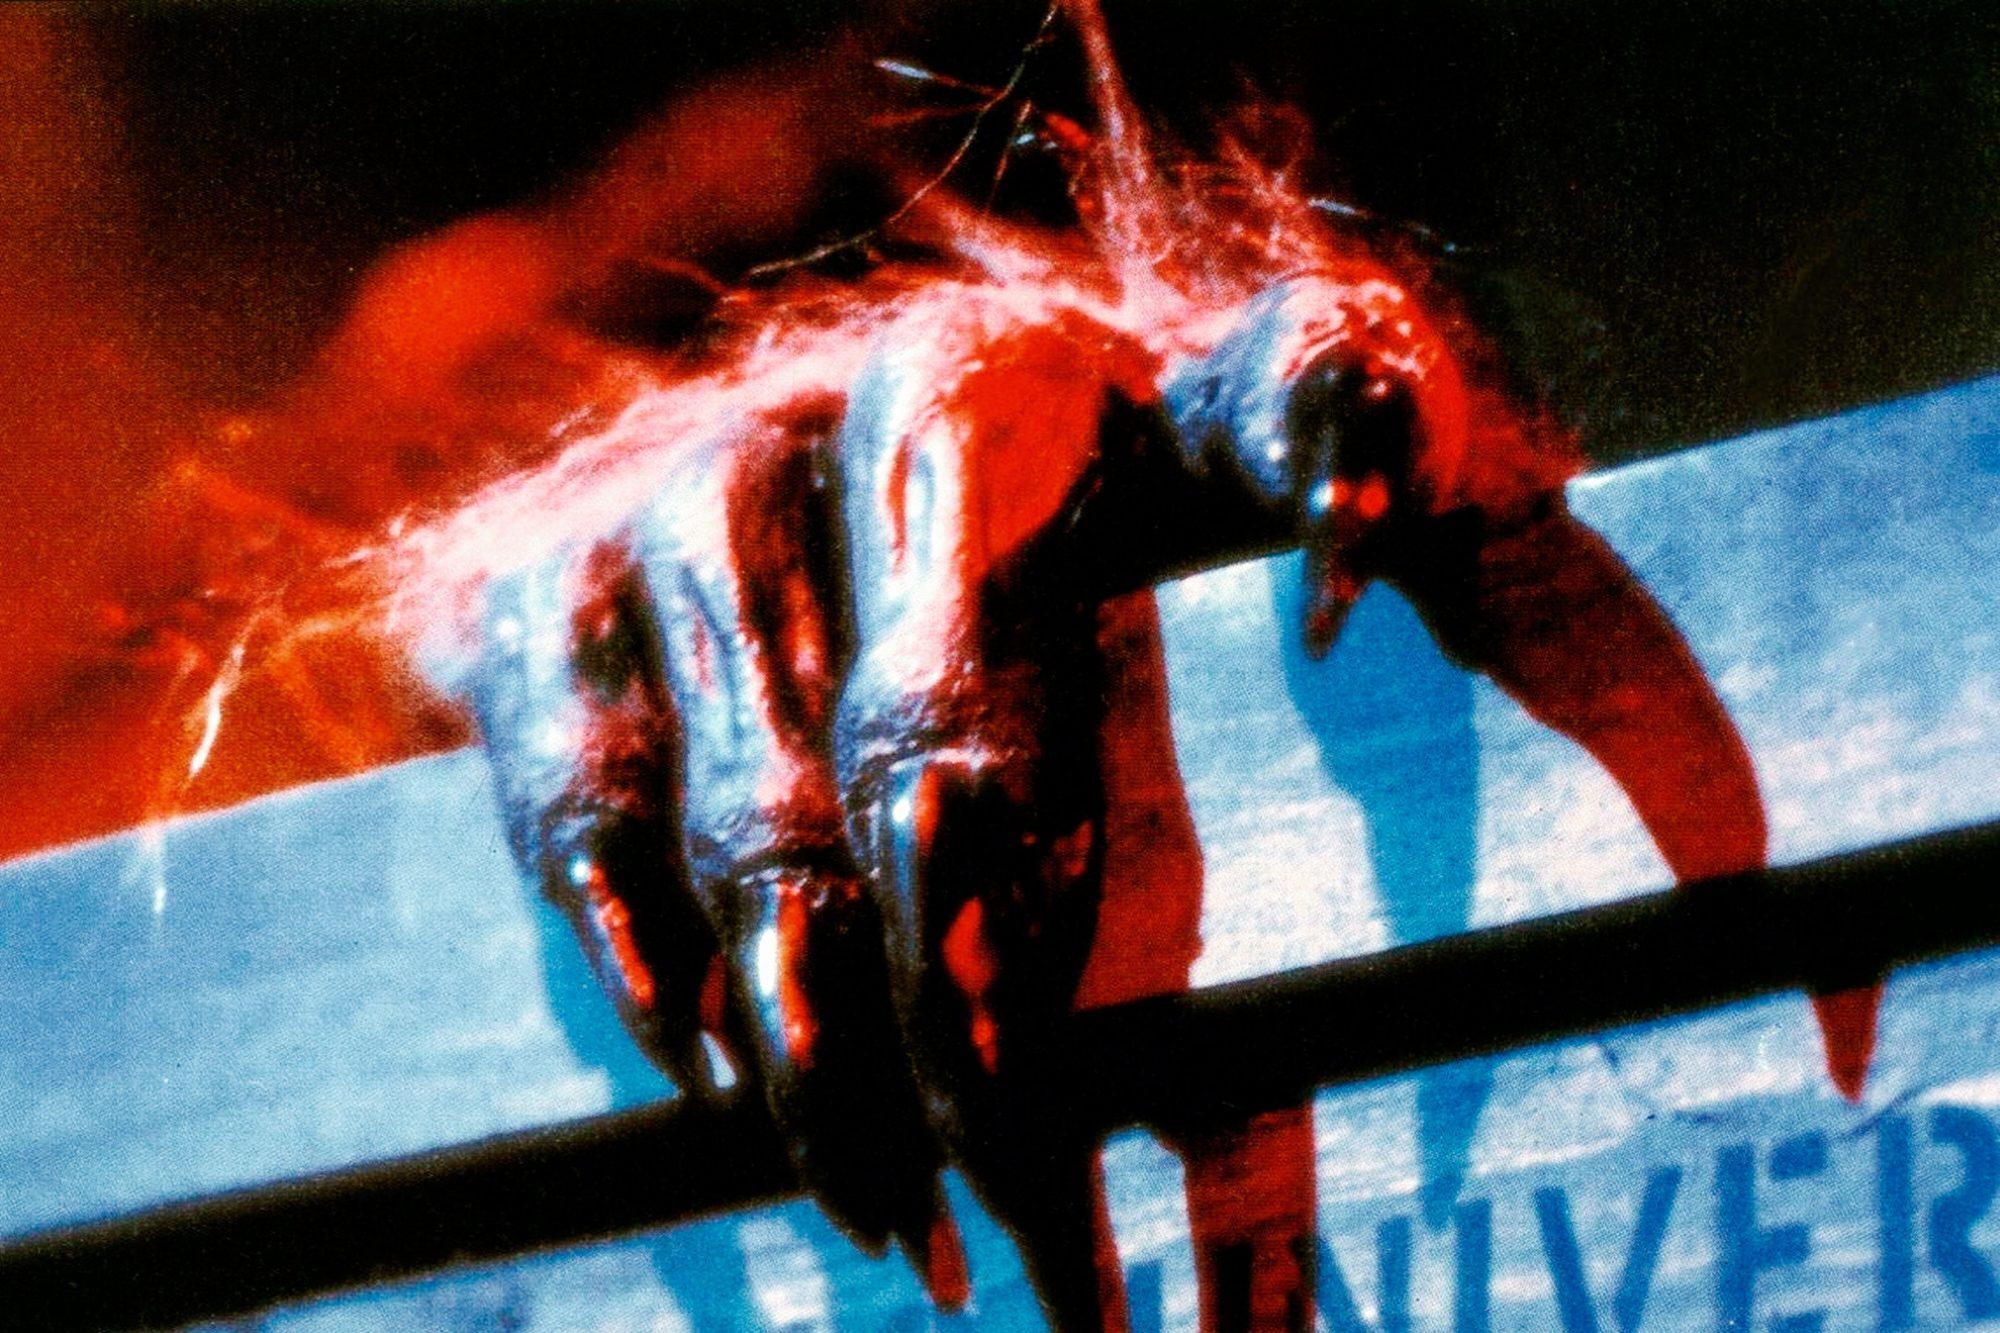 Creepshow - 1982